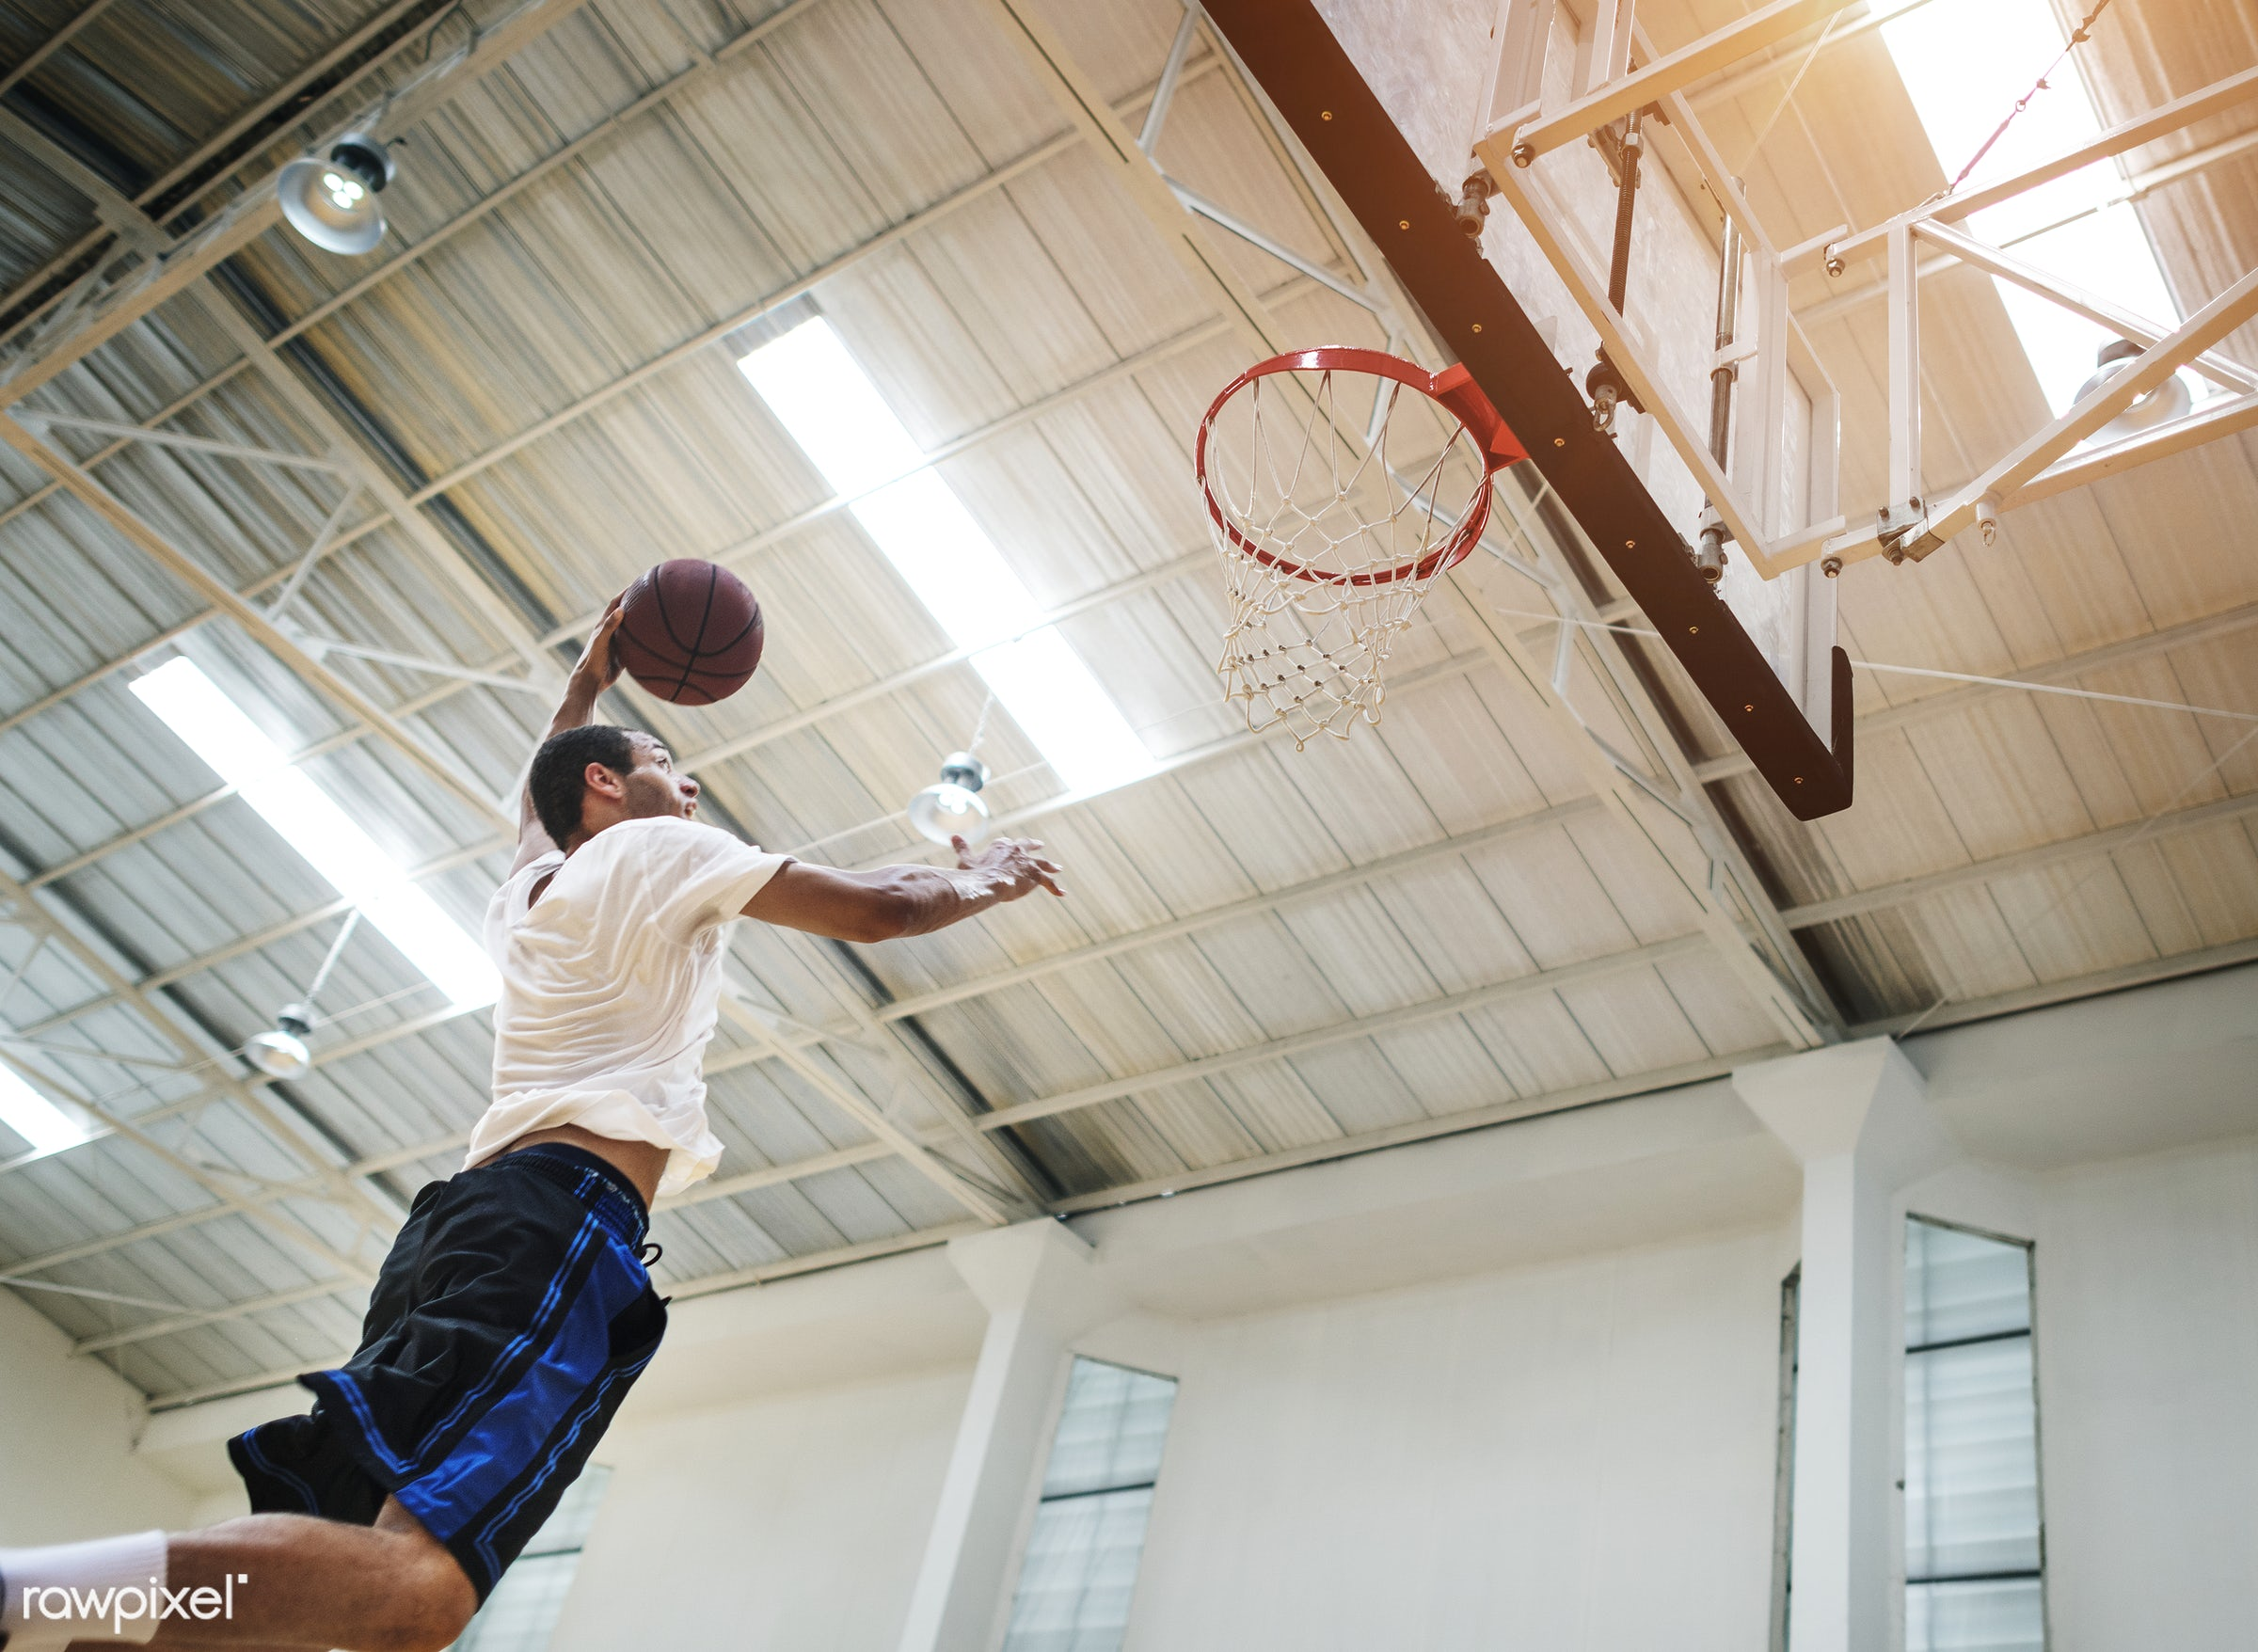 Young basketball player shoot - jump, activity, alone, basketball, boy, court, dunk, exercise, game, gym, gymnasium, man,...